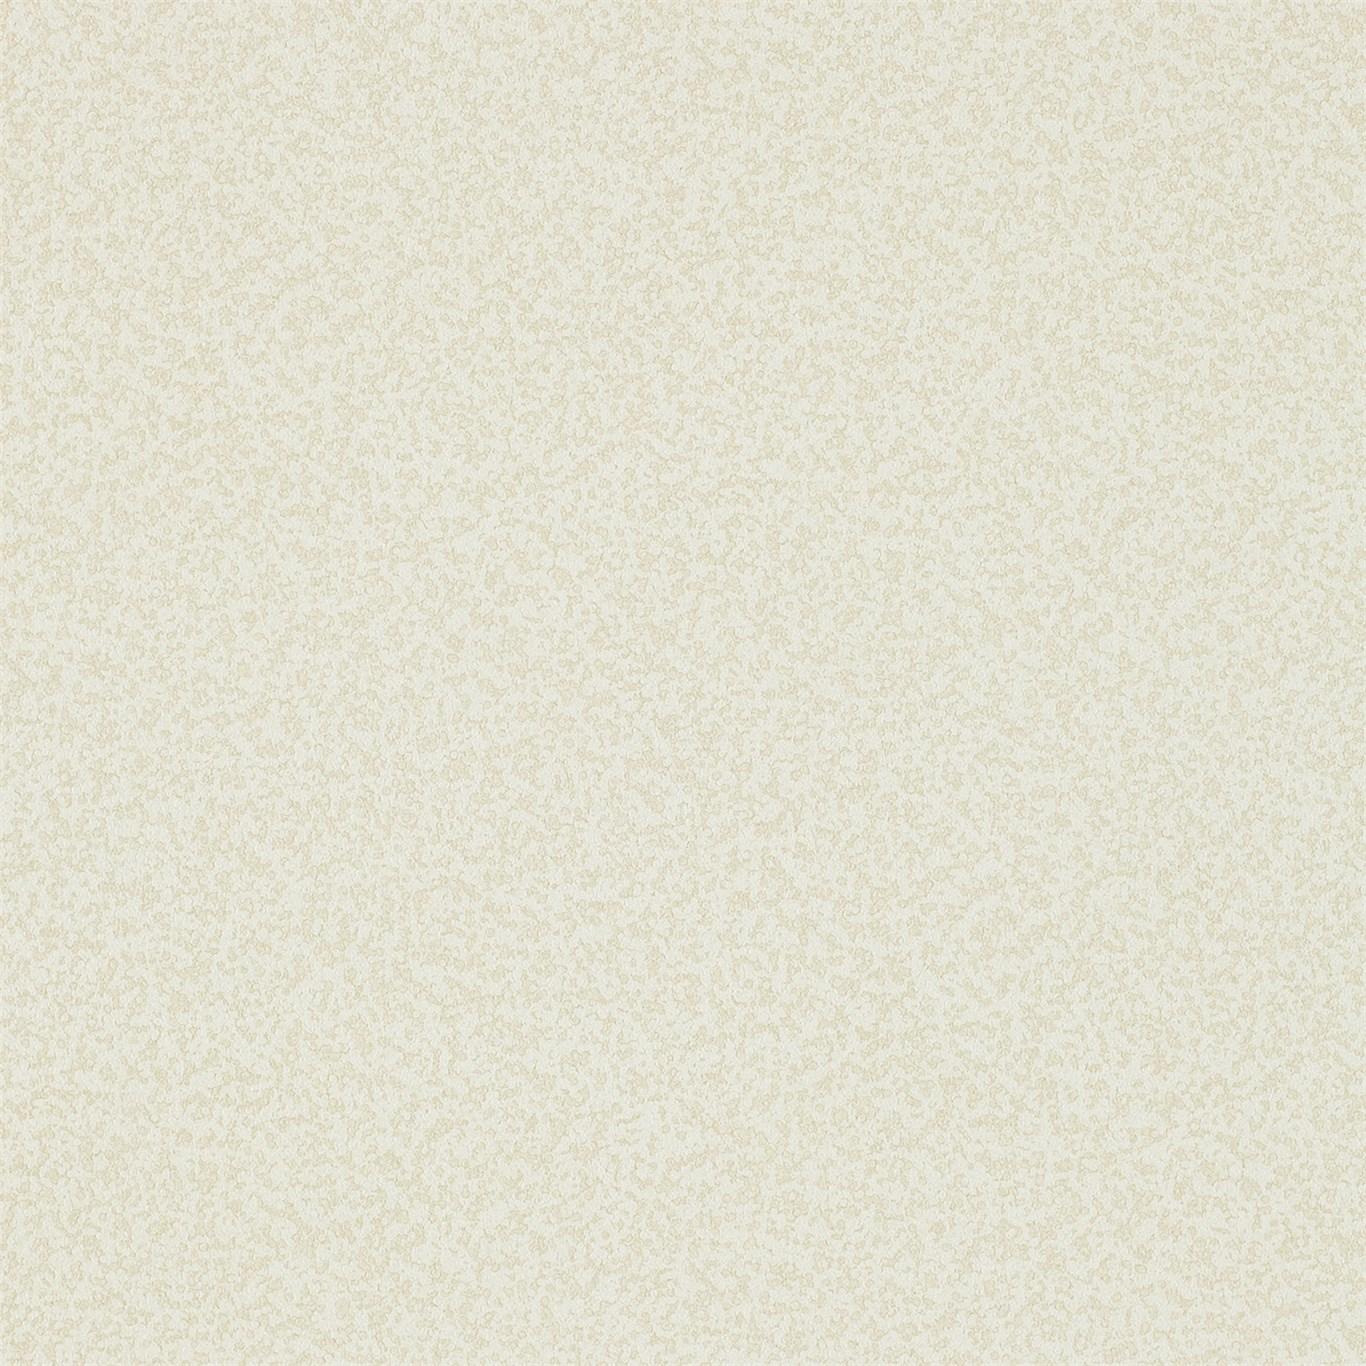 Английские обои Zoffany,  коллекция Prism Vinyls, артикул311763